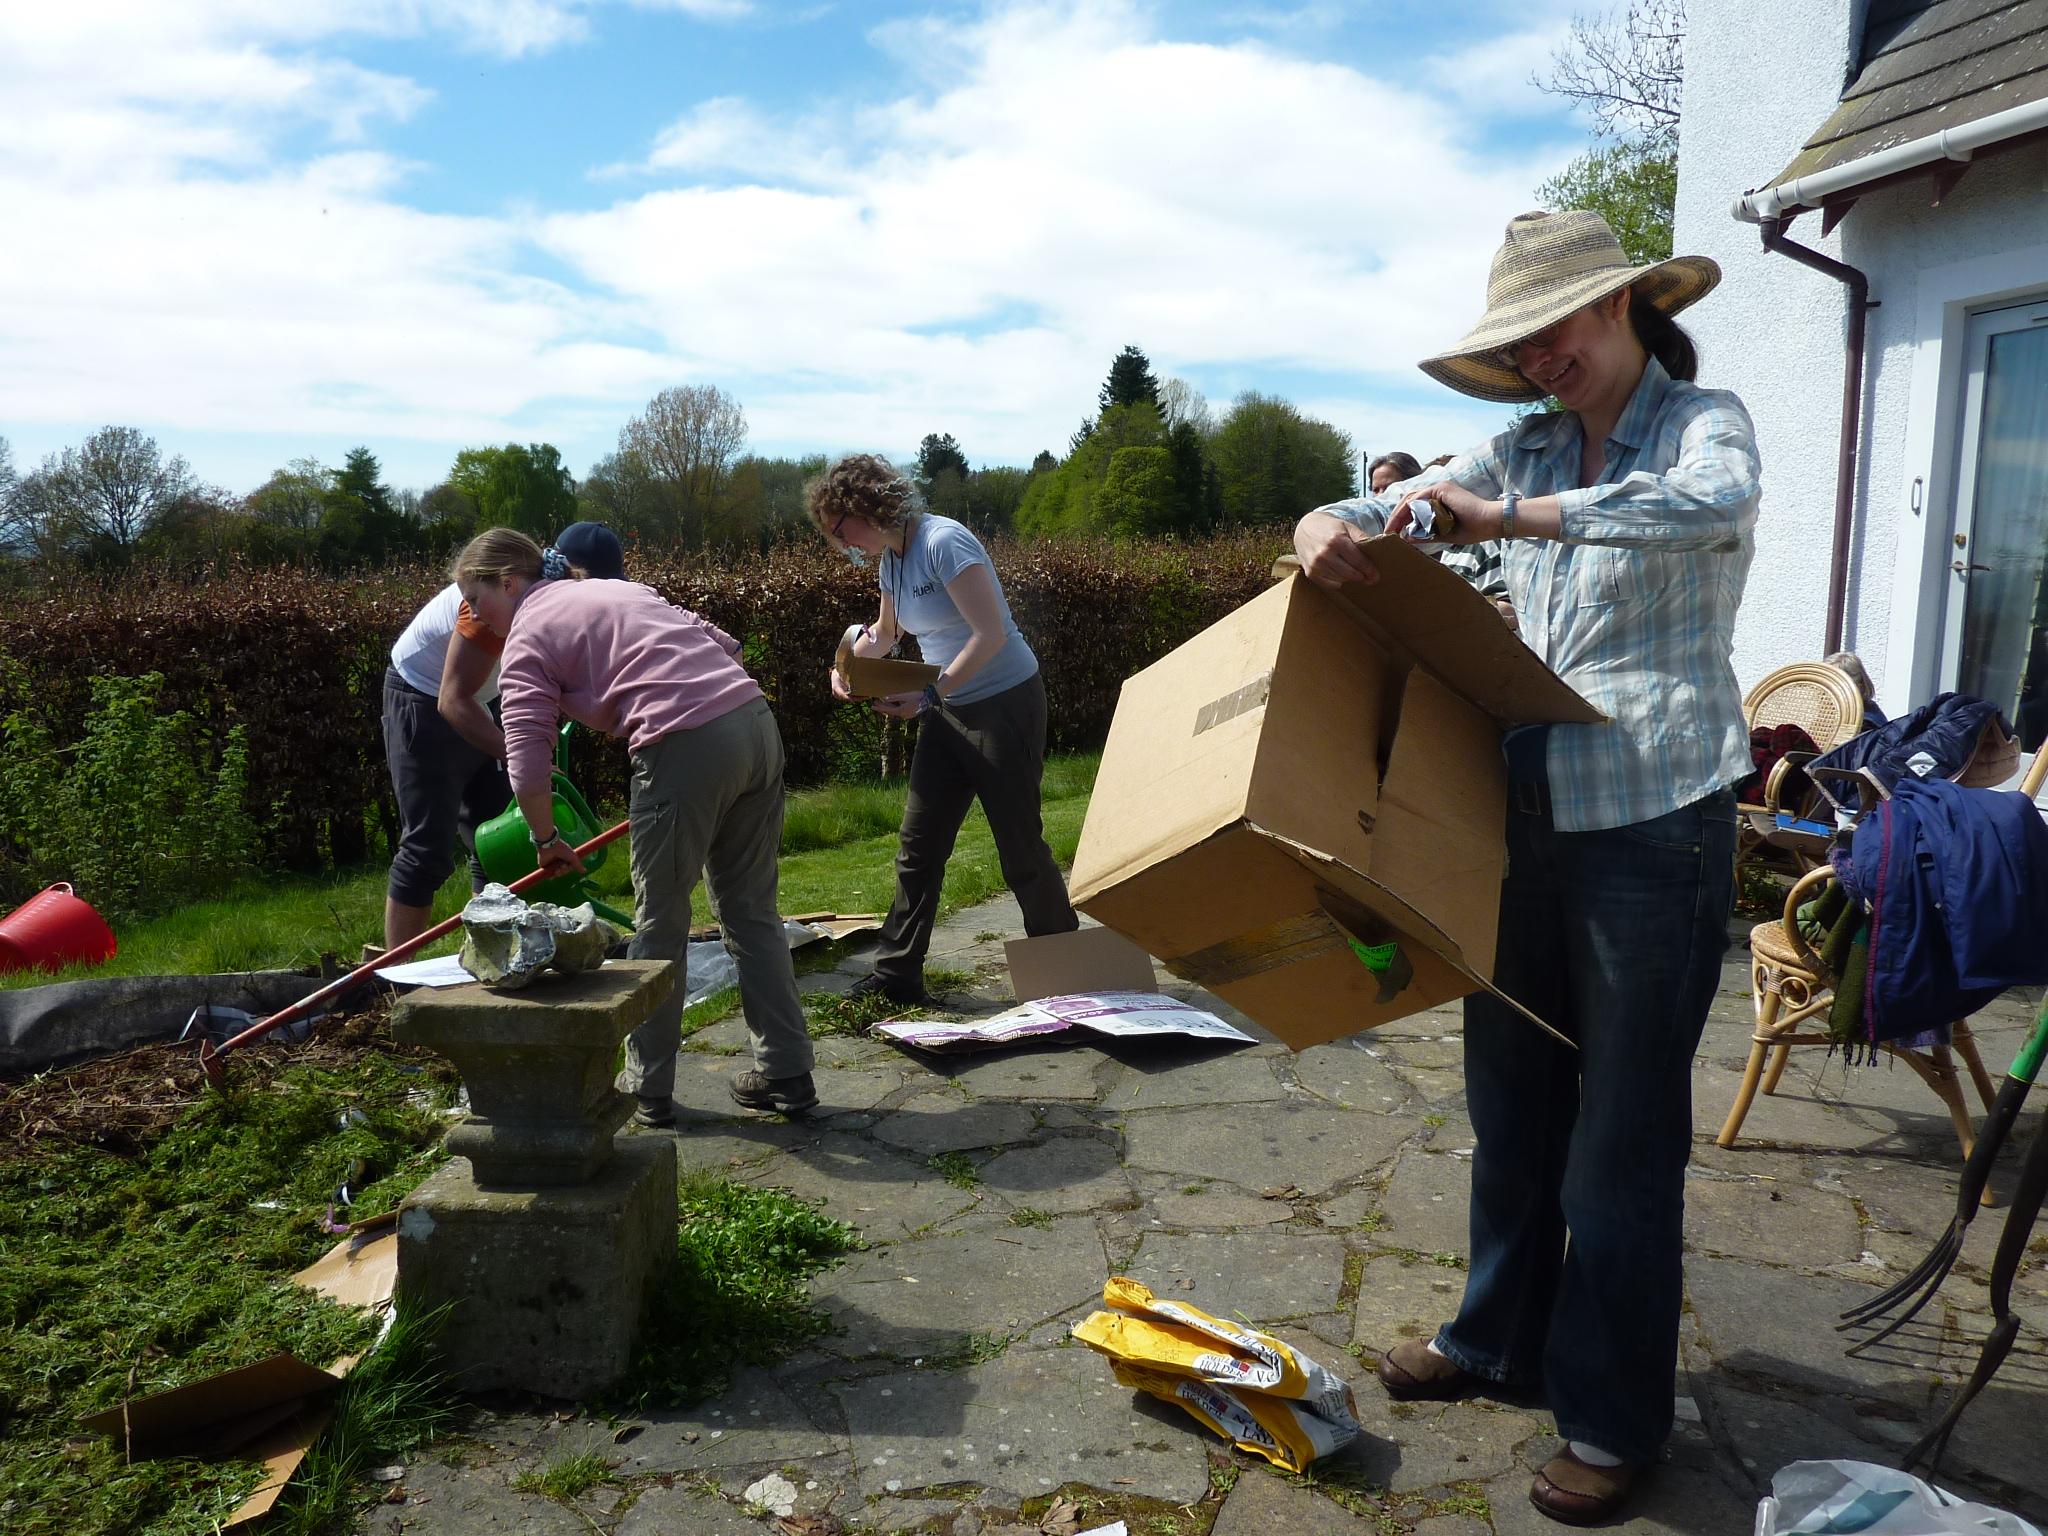 Making Hugel Beds during 'Permaculture in the Garden' workshop Summer 2017